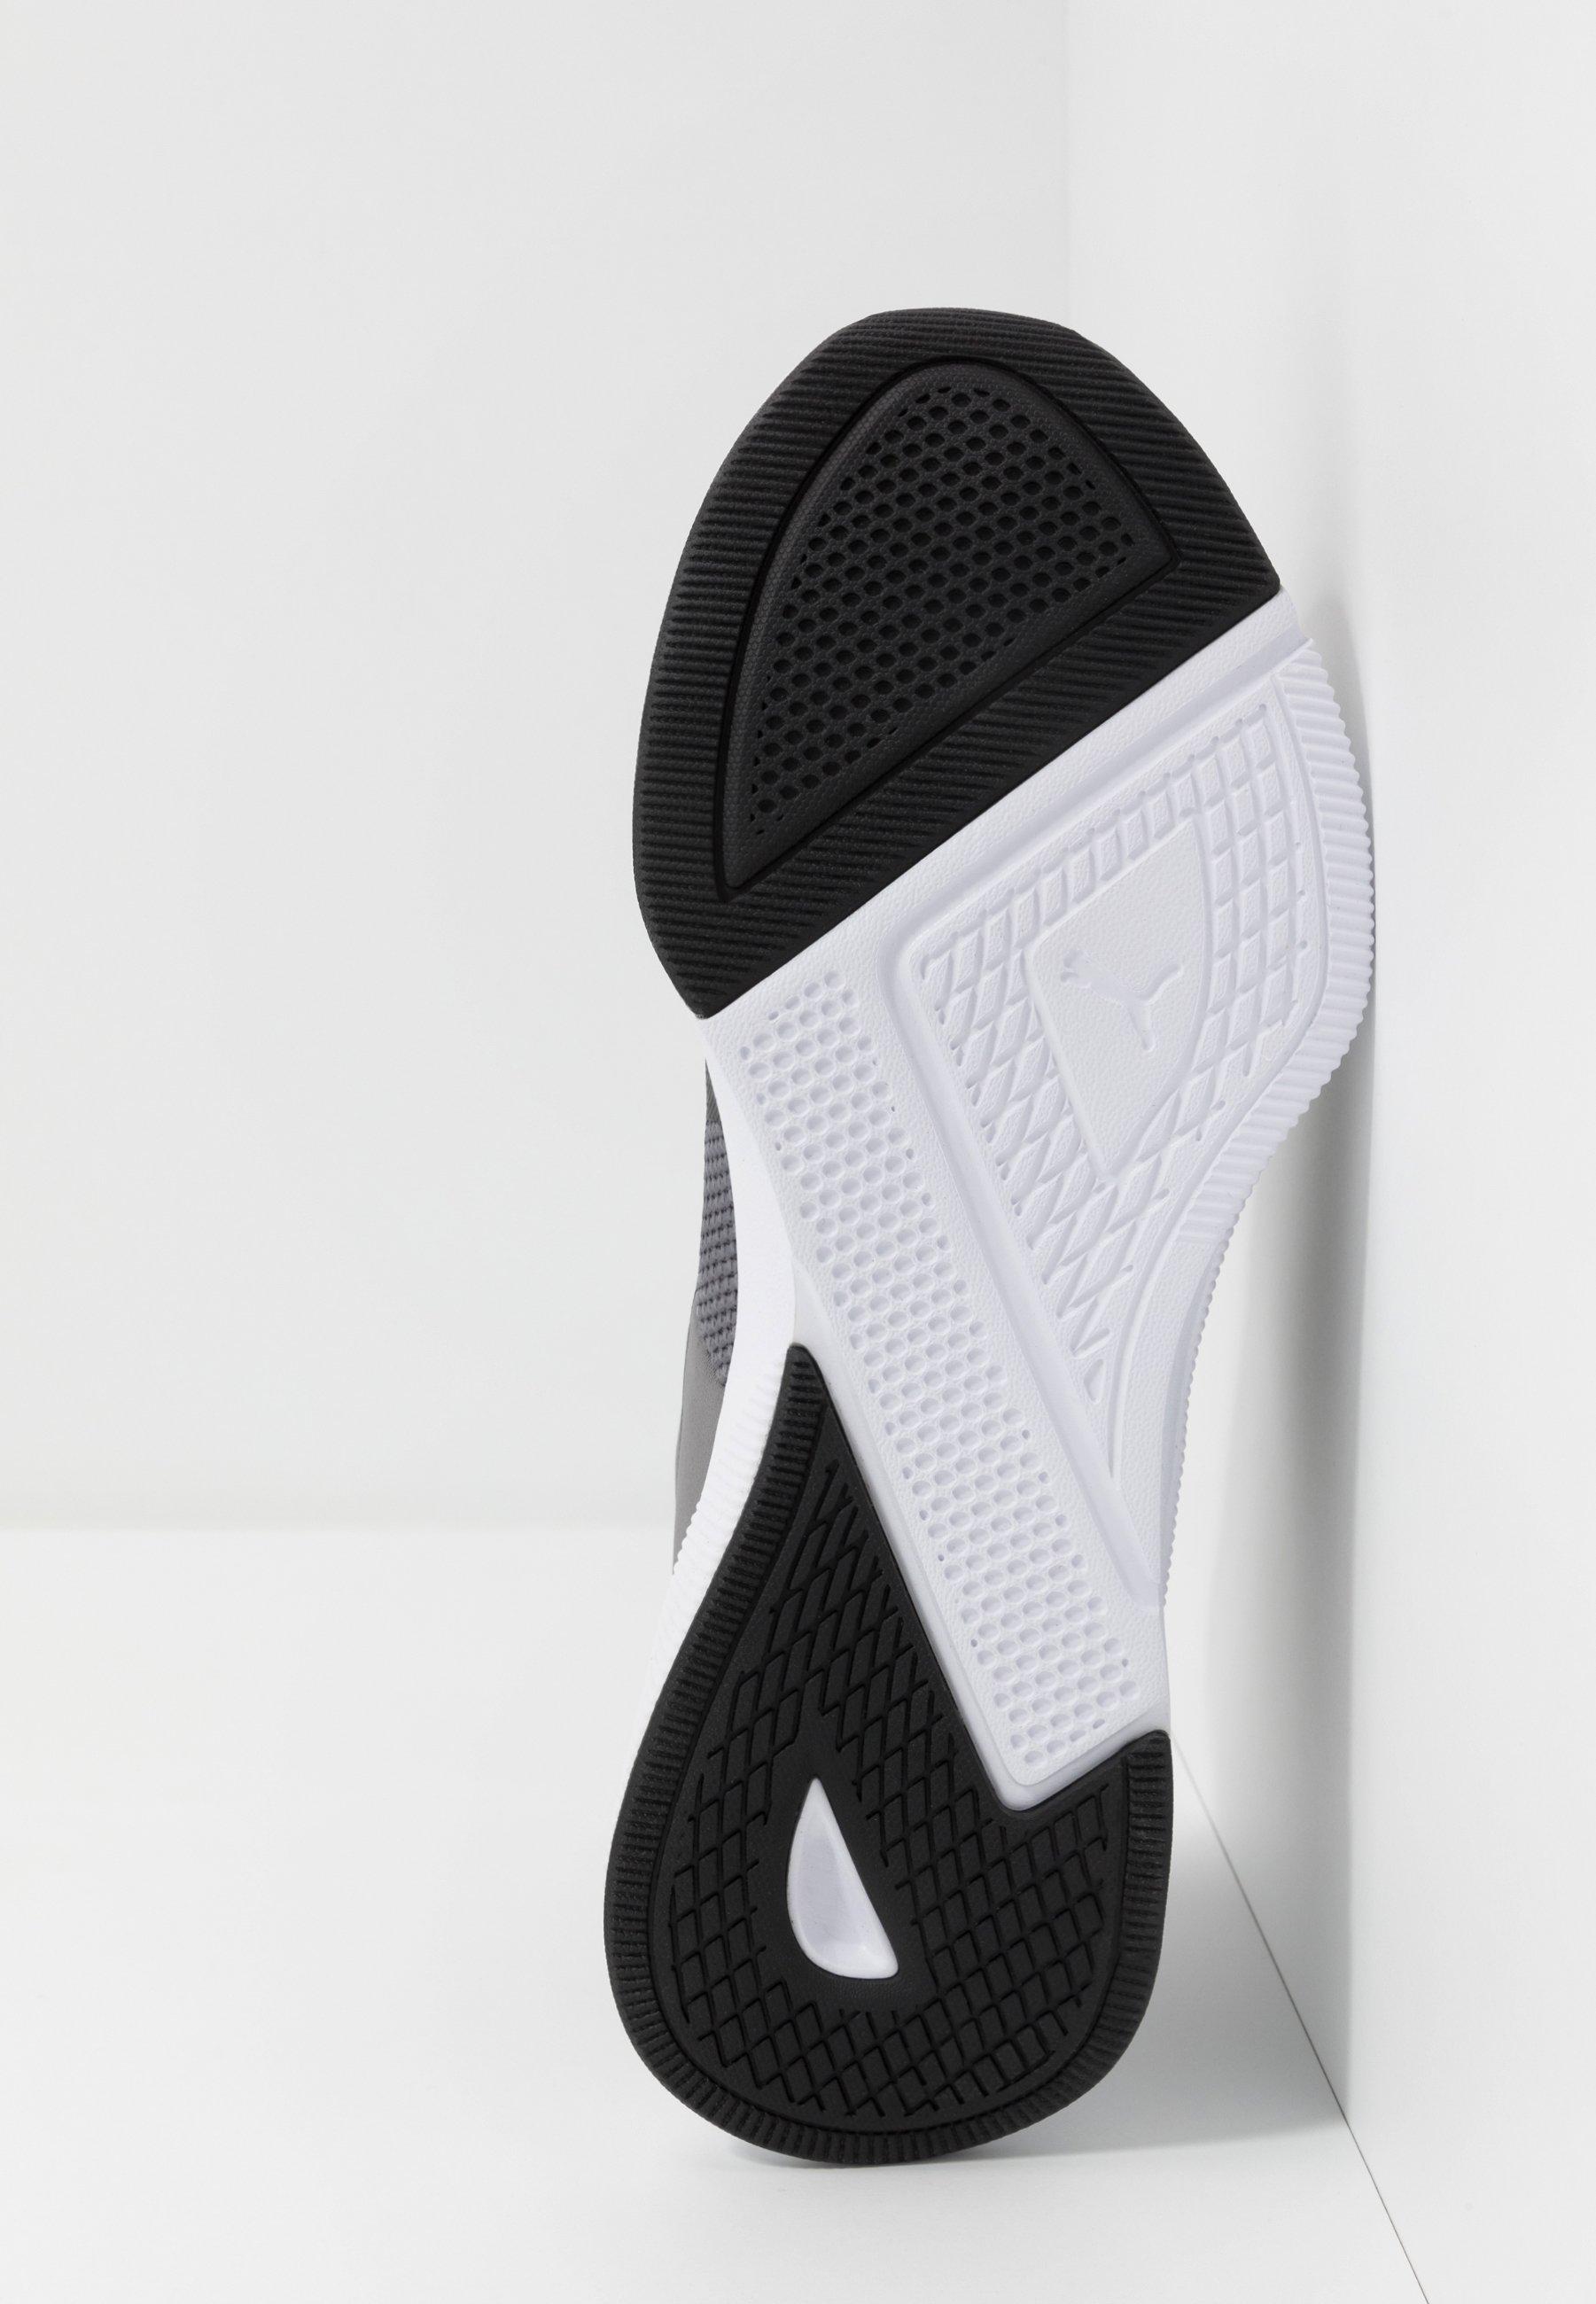 Puma Flyer Runner - Chaussures De Running Neutres Charcoal Gray/black/blue Turquoise